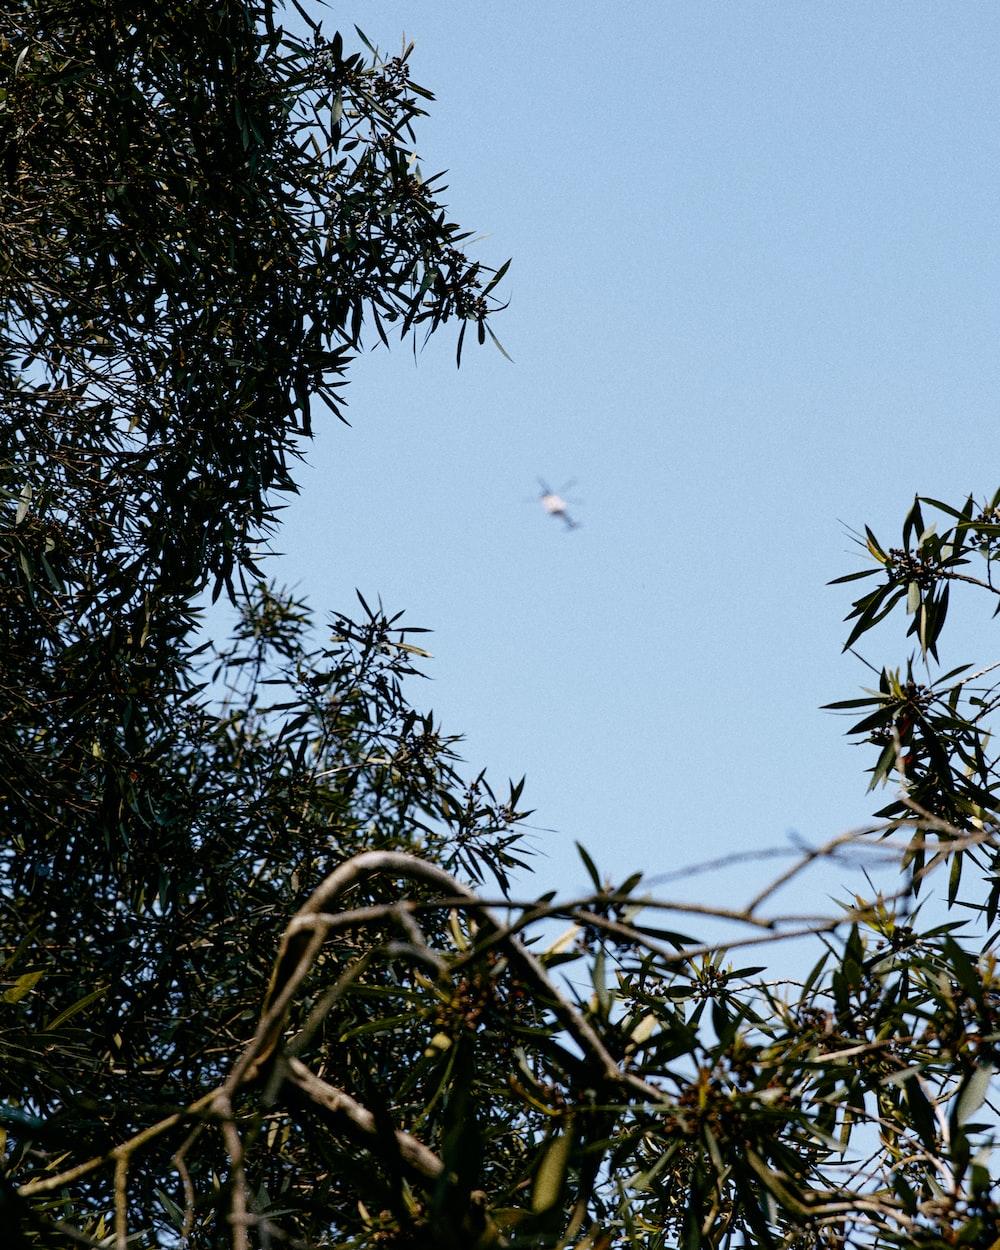 birds flying over green tree during daytime